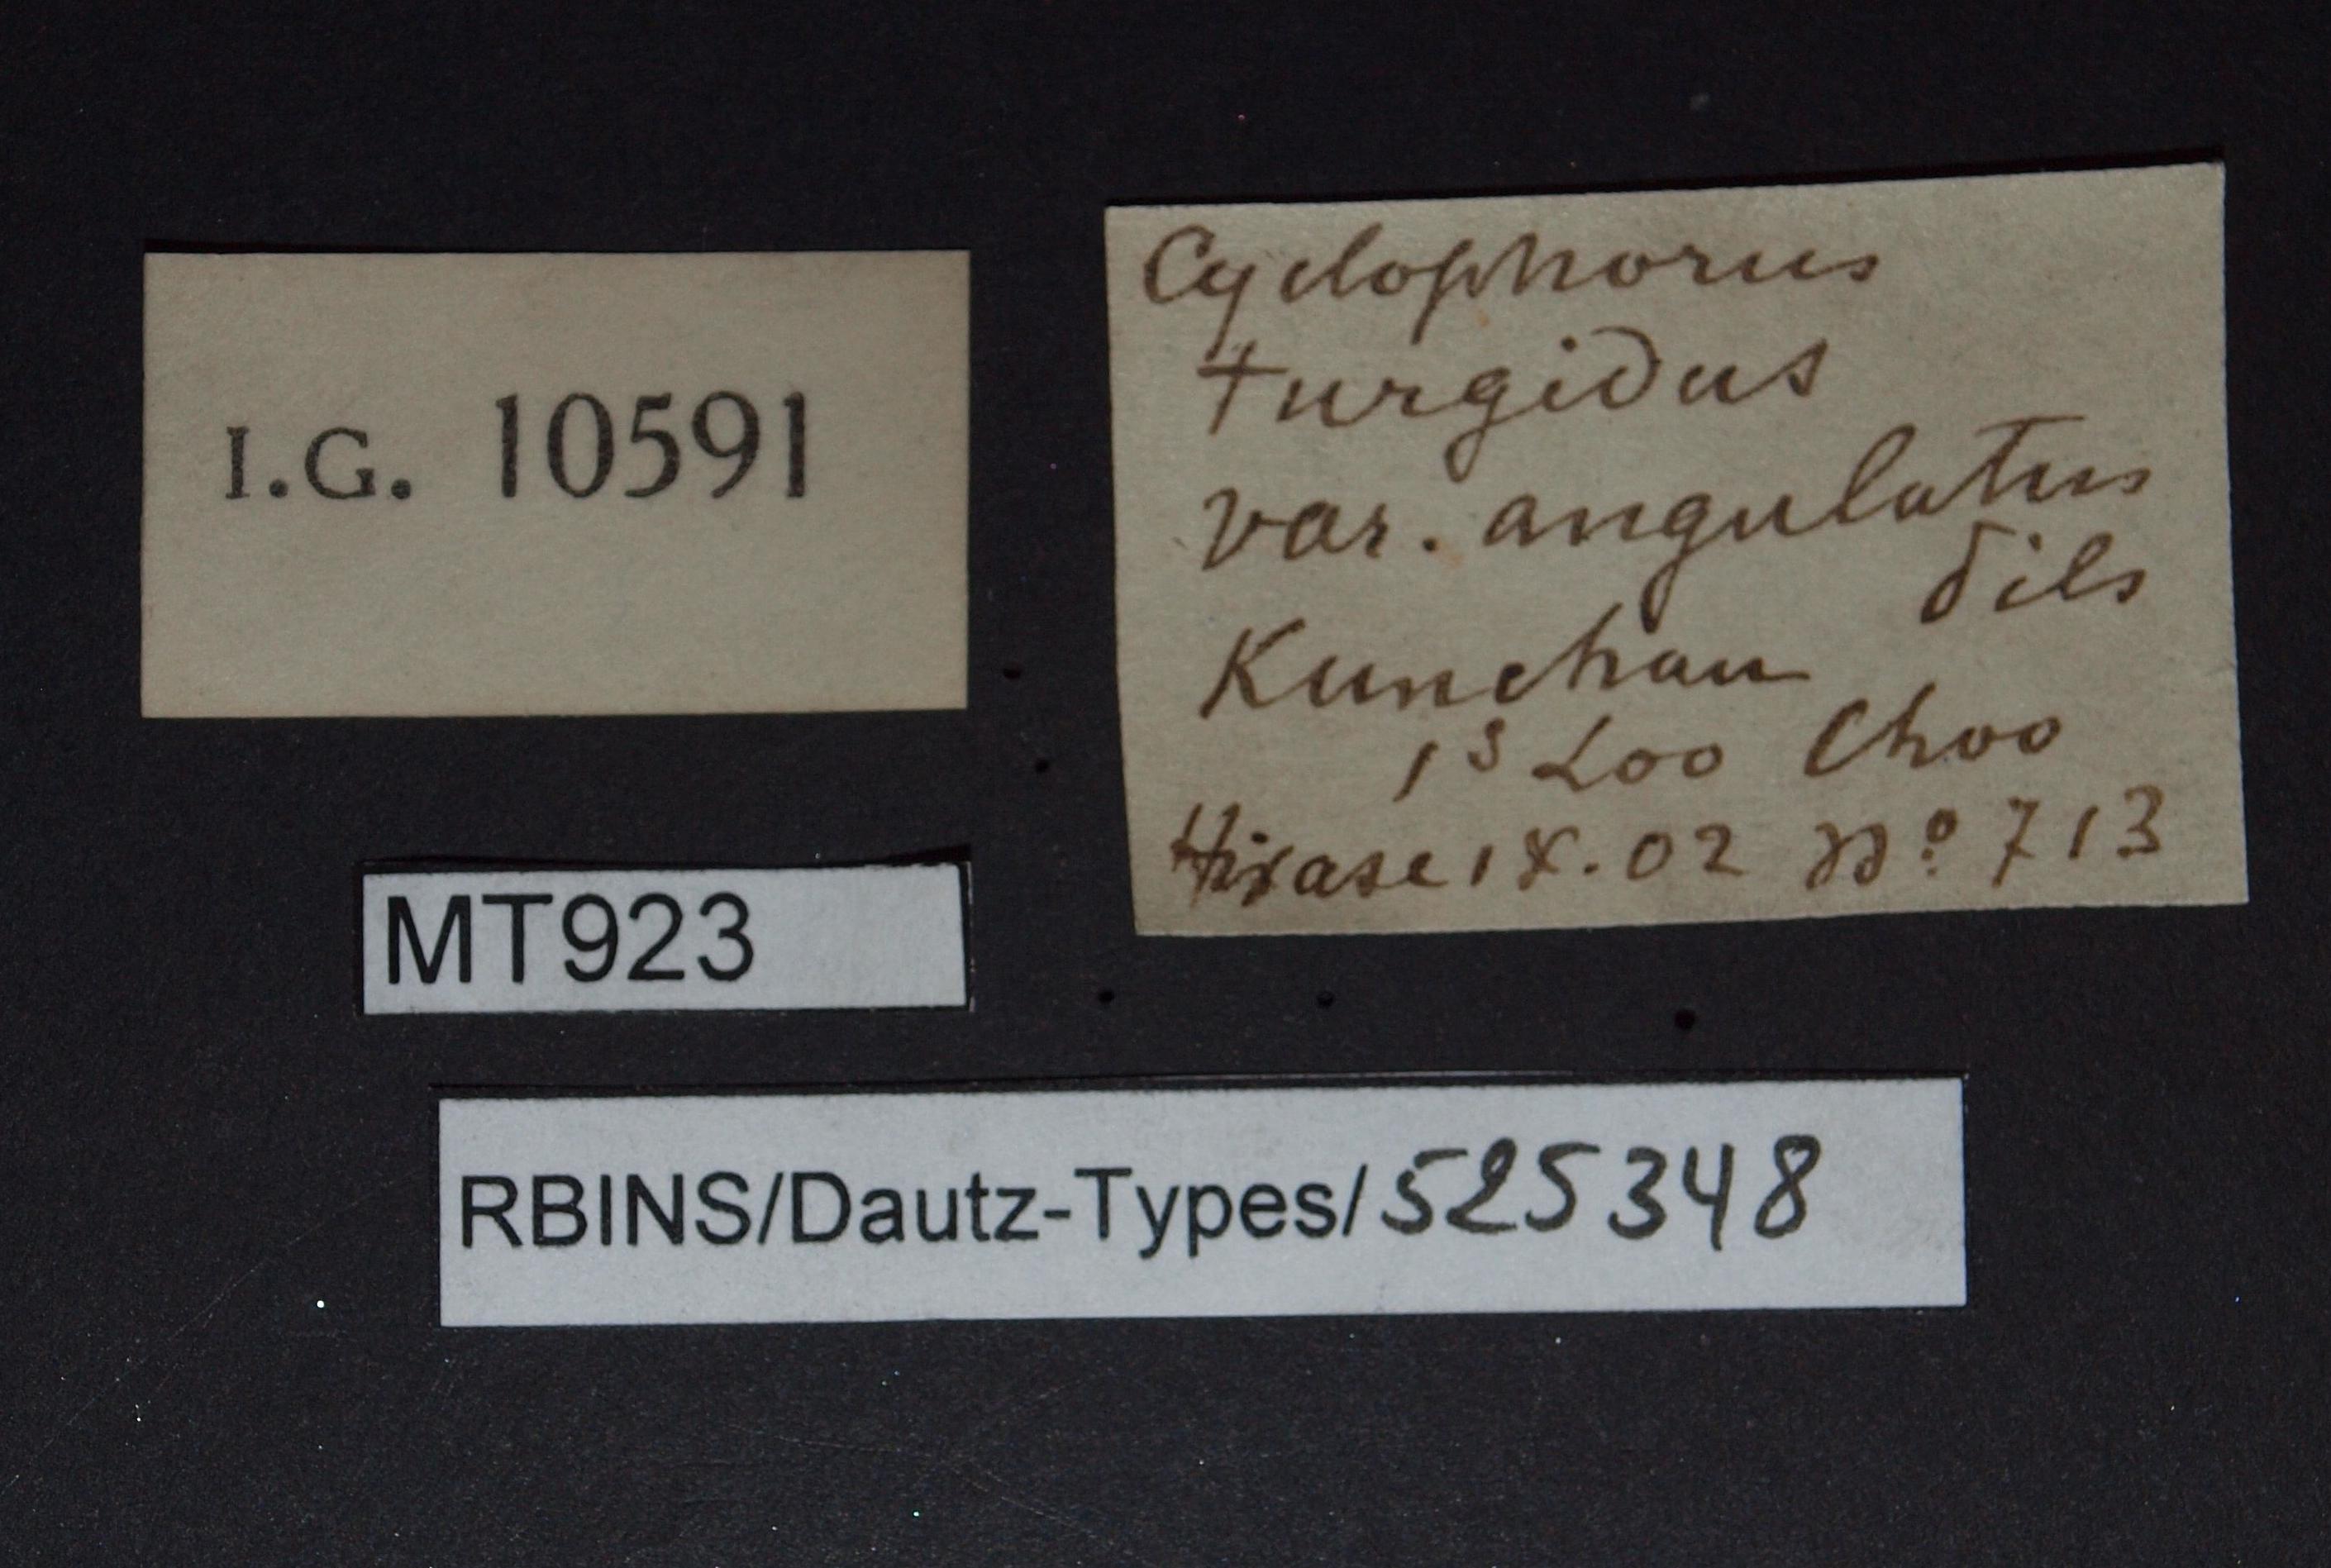 BE-RBINS-INV MT 923 Cyclophorus turgidus var. angulatus pt Lb.jpg